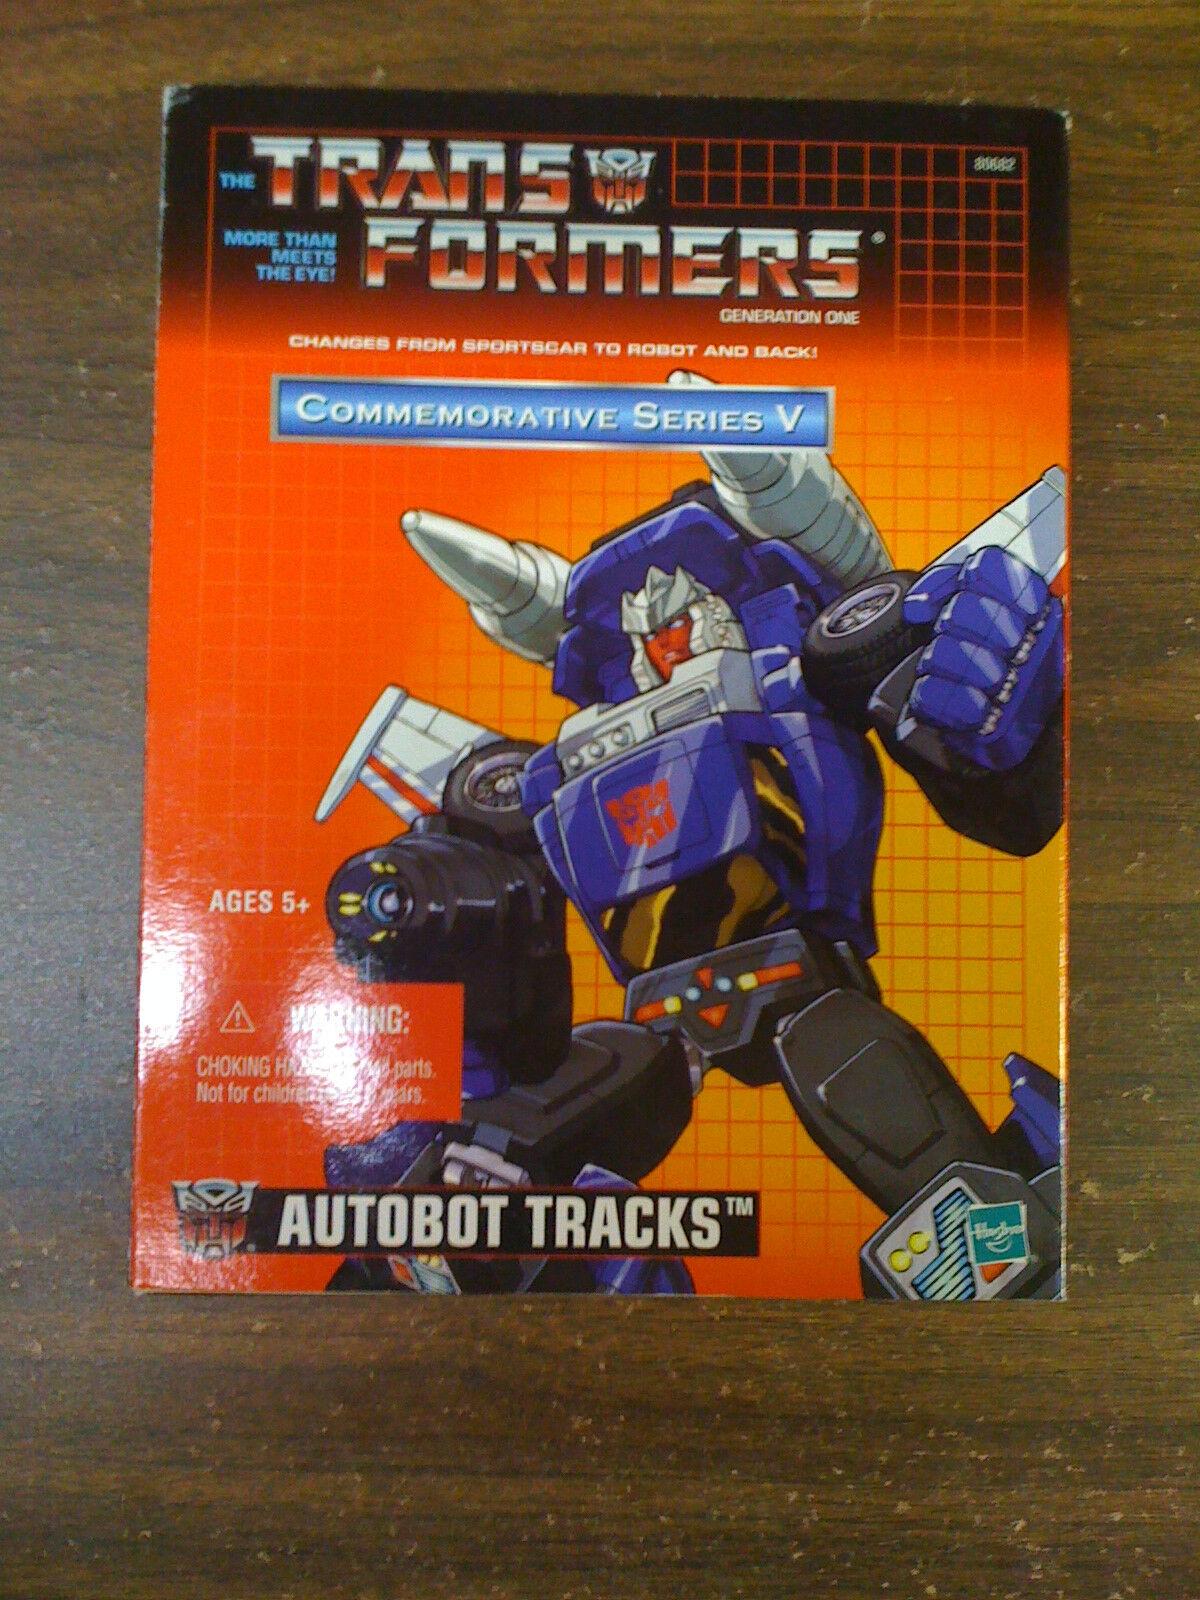 Transformers G1 Reissue Commemorative Edition Tracks TRU EX NEW NEW NEW FREE SHIP US ec2